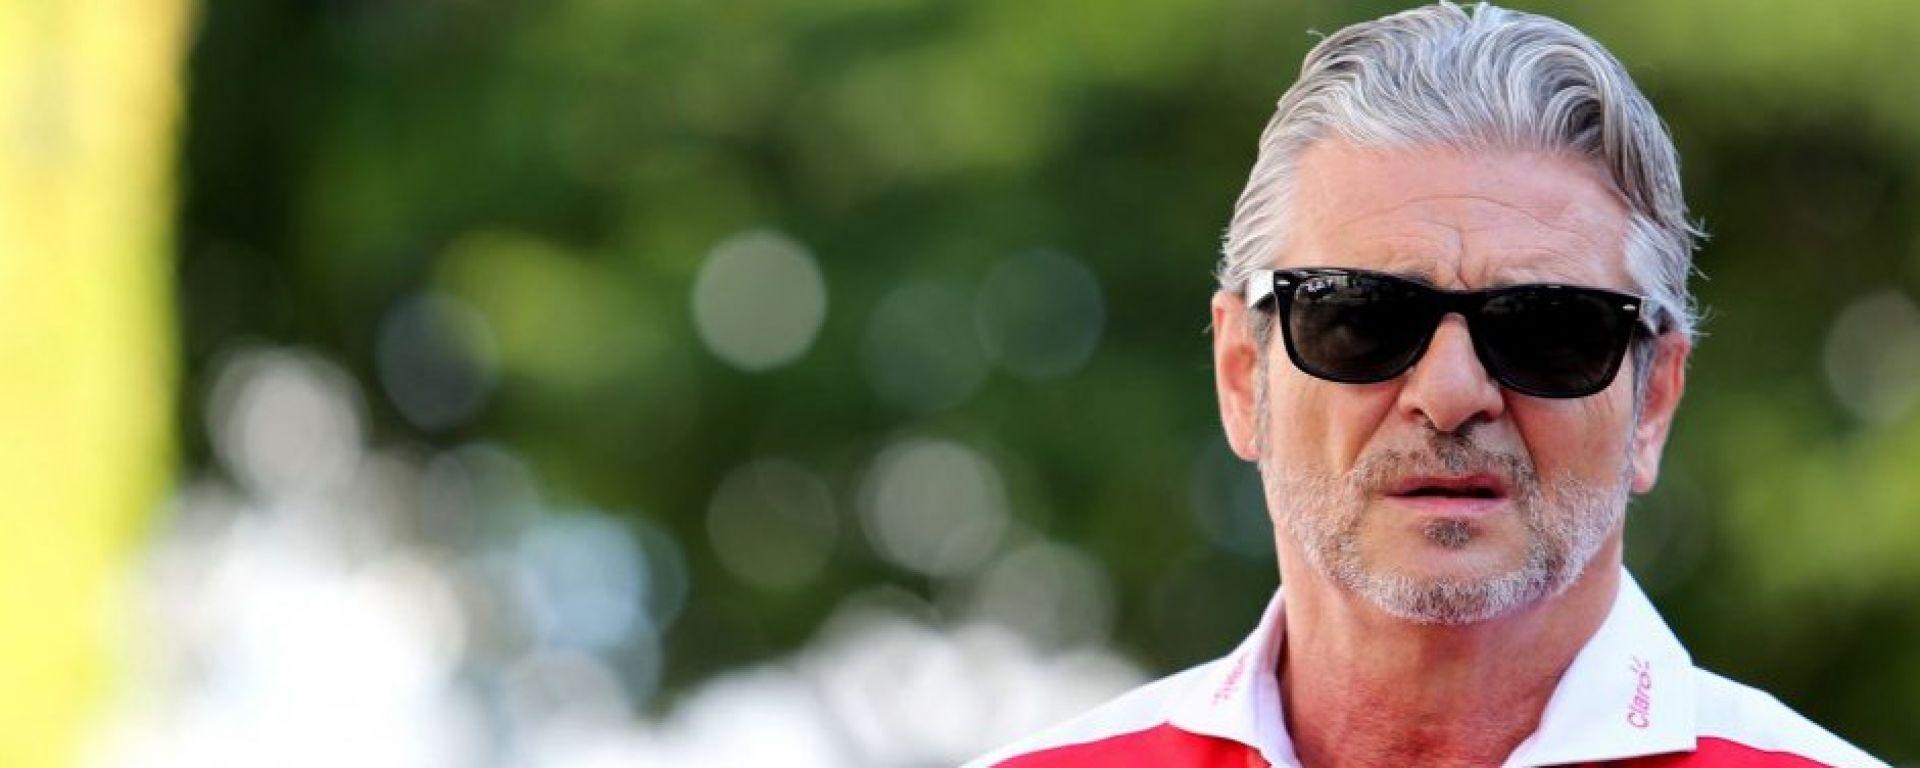 Maurizio Arrivabene - F1 GP Singapore